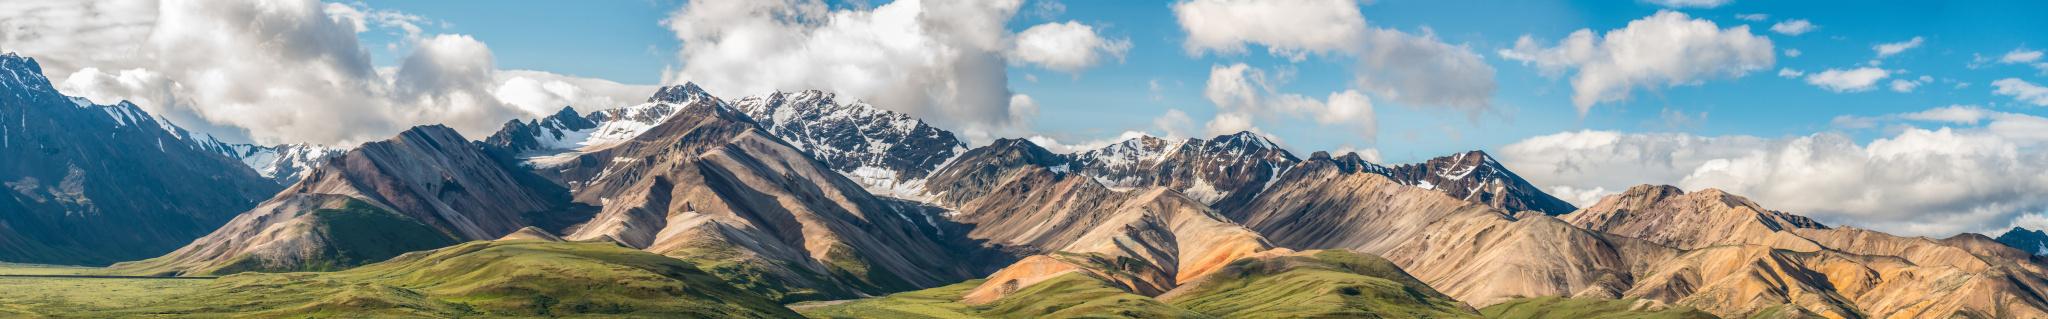 Denali National Park and Preserve - Nikon D800 w/ 24-70mm f/2.8